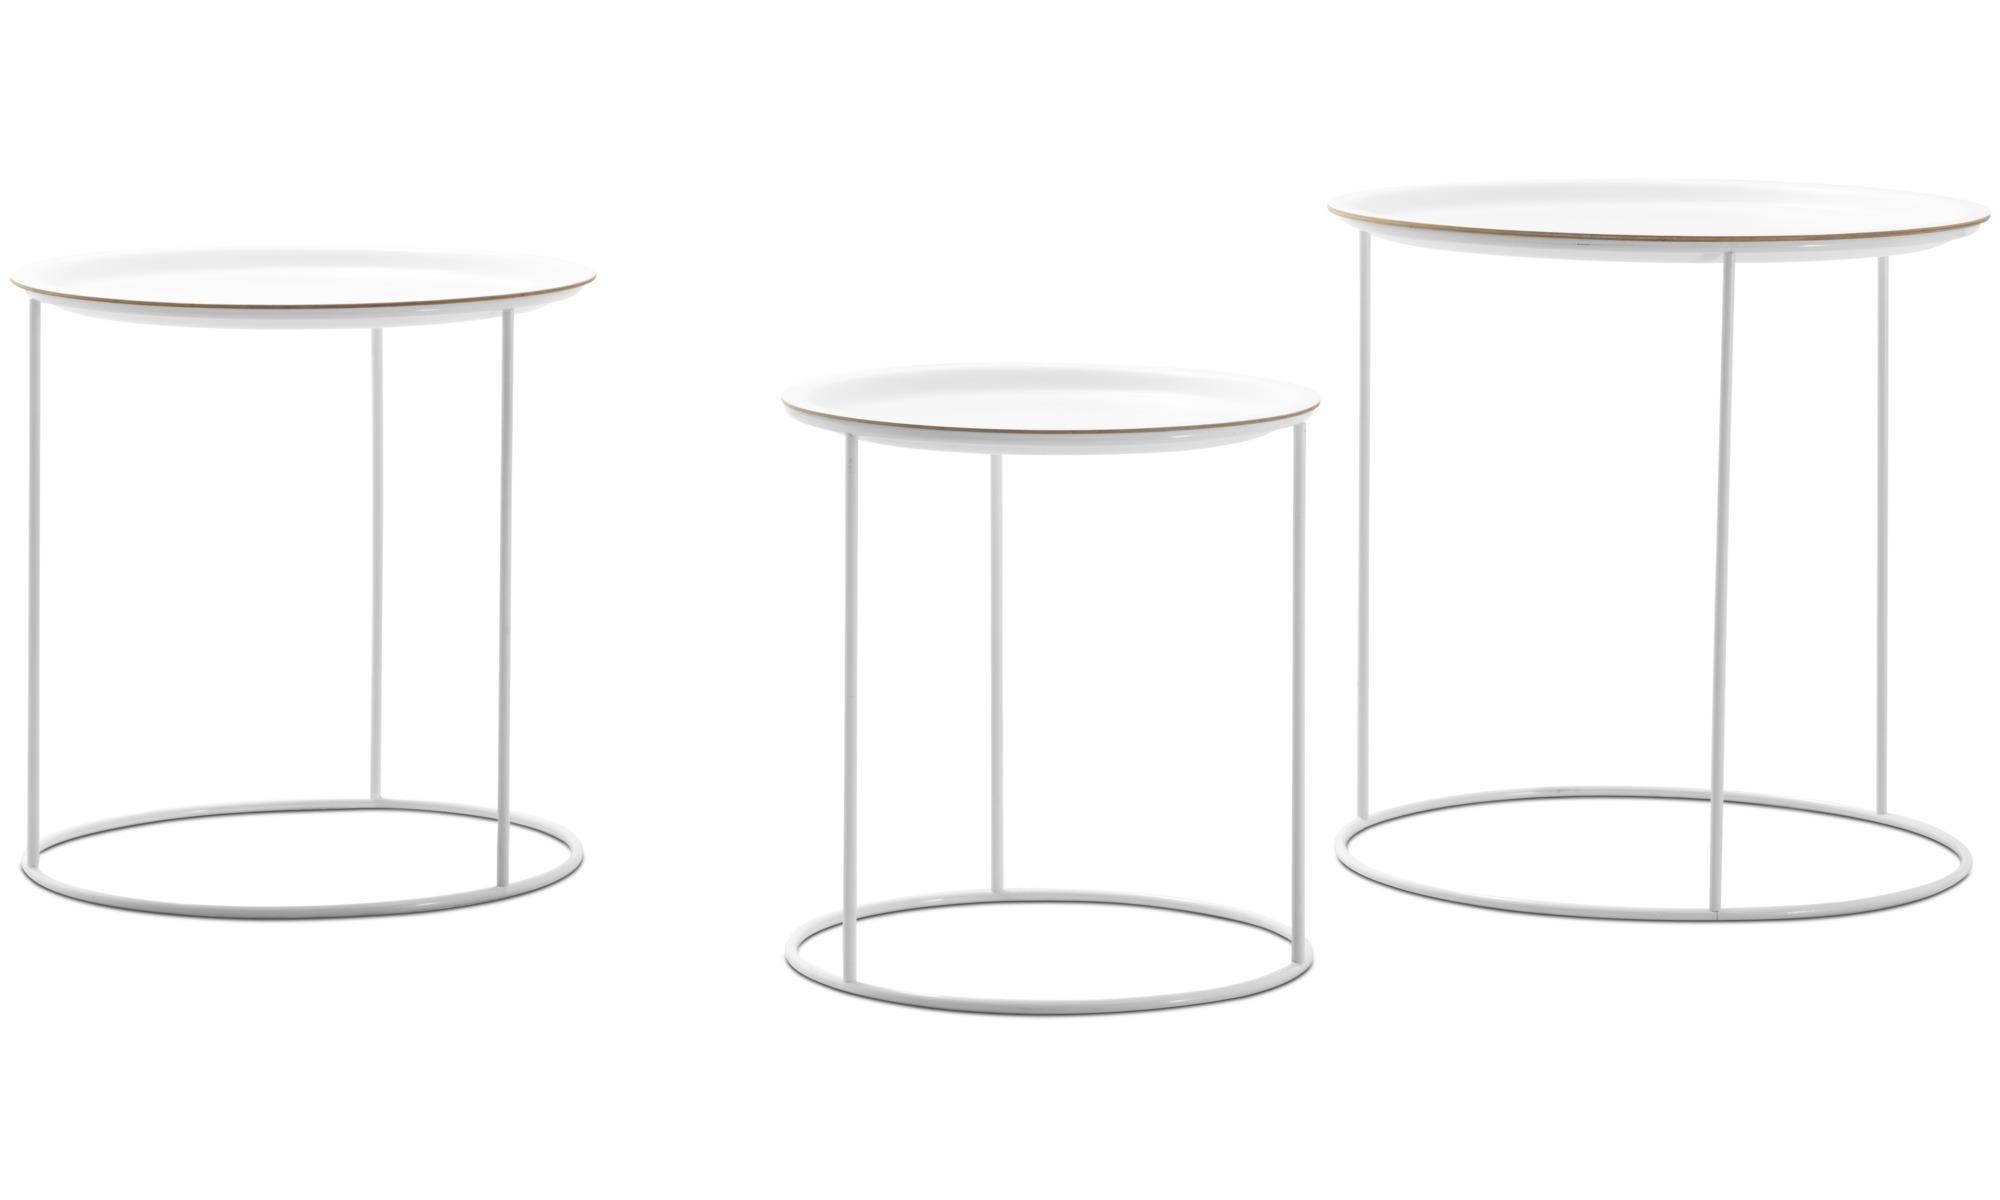 Petits meubles - Tables gigognes Cartagena - rotonde - Blanc - Laqué